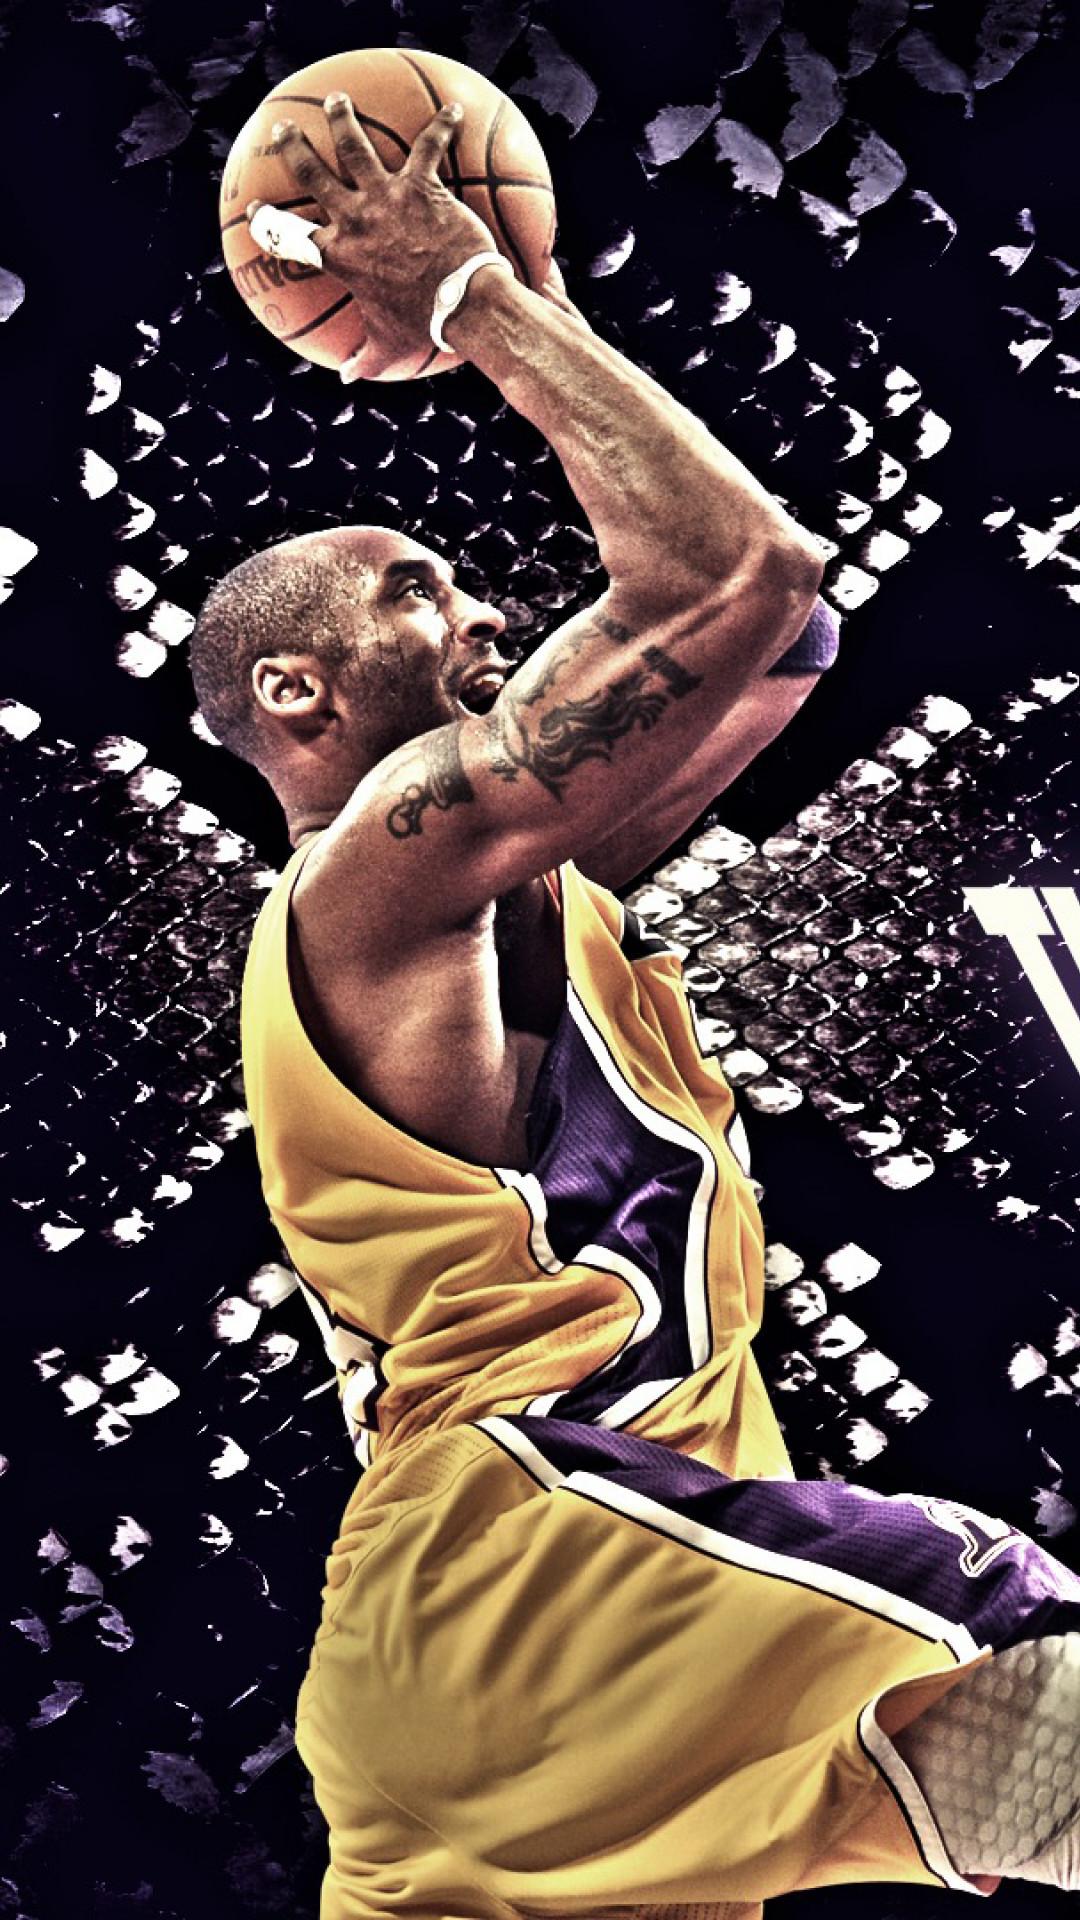 Kobe Bryant Black Mamba HD wallpaper